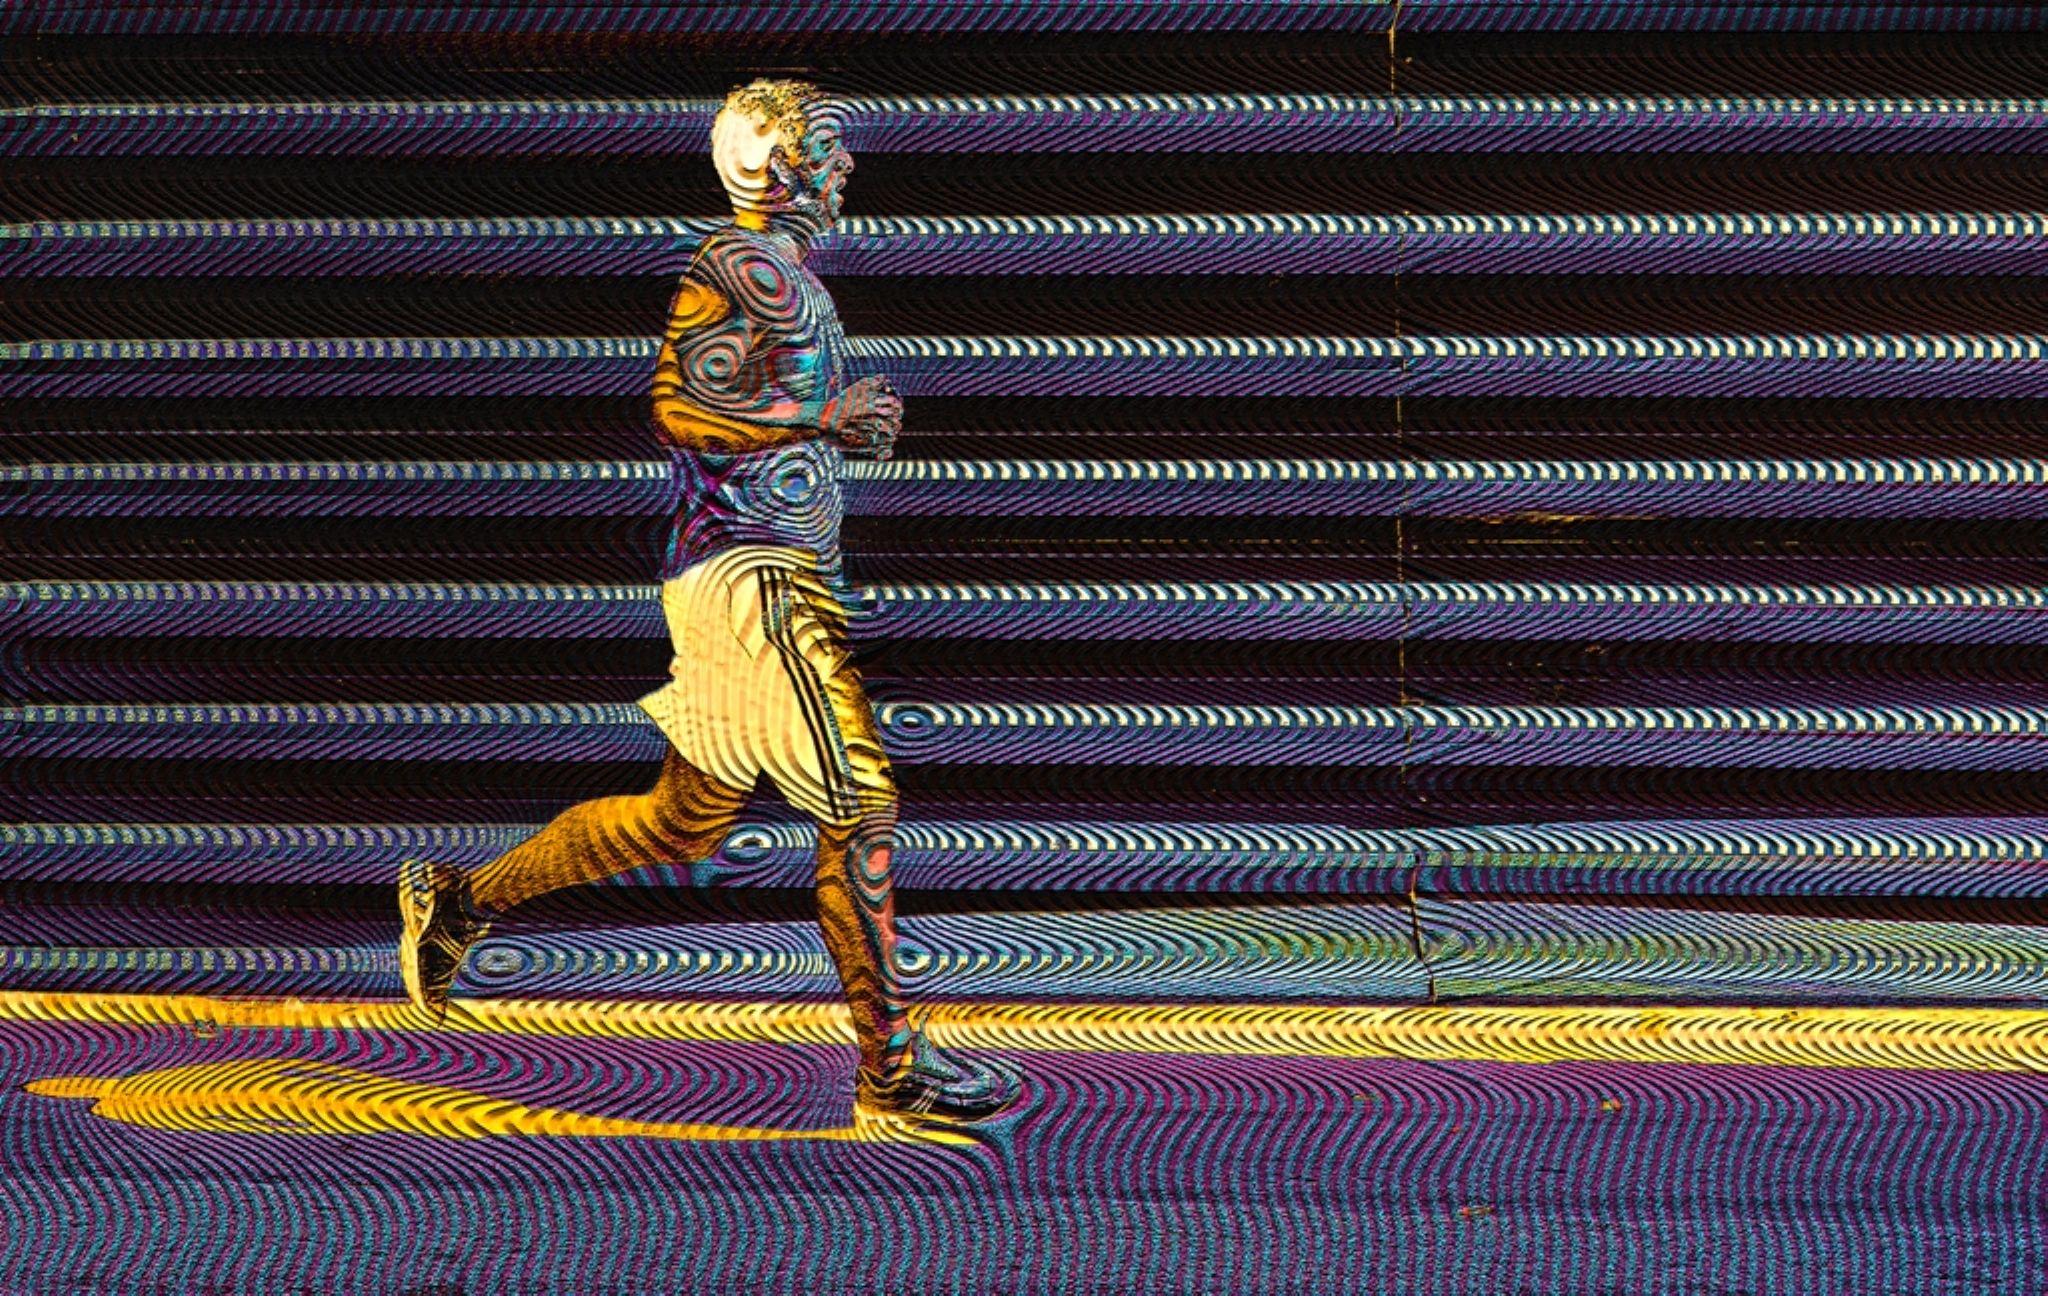 The cyber runner by valcir.siqueira.7